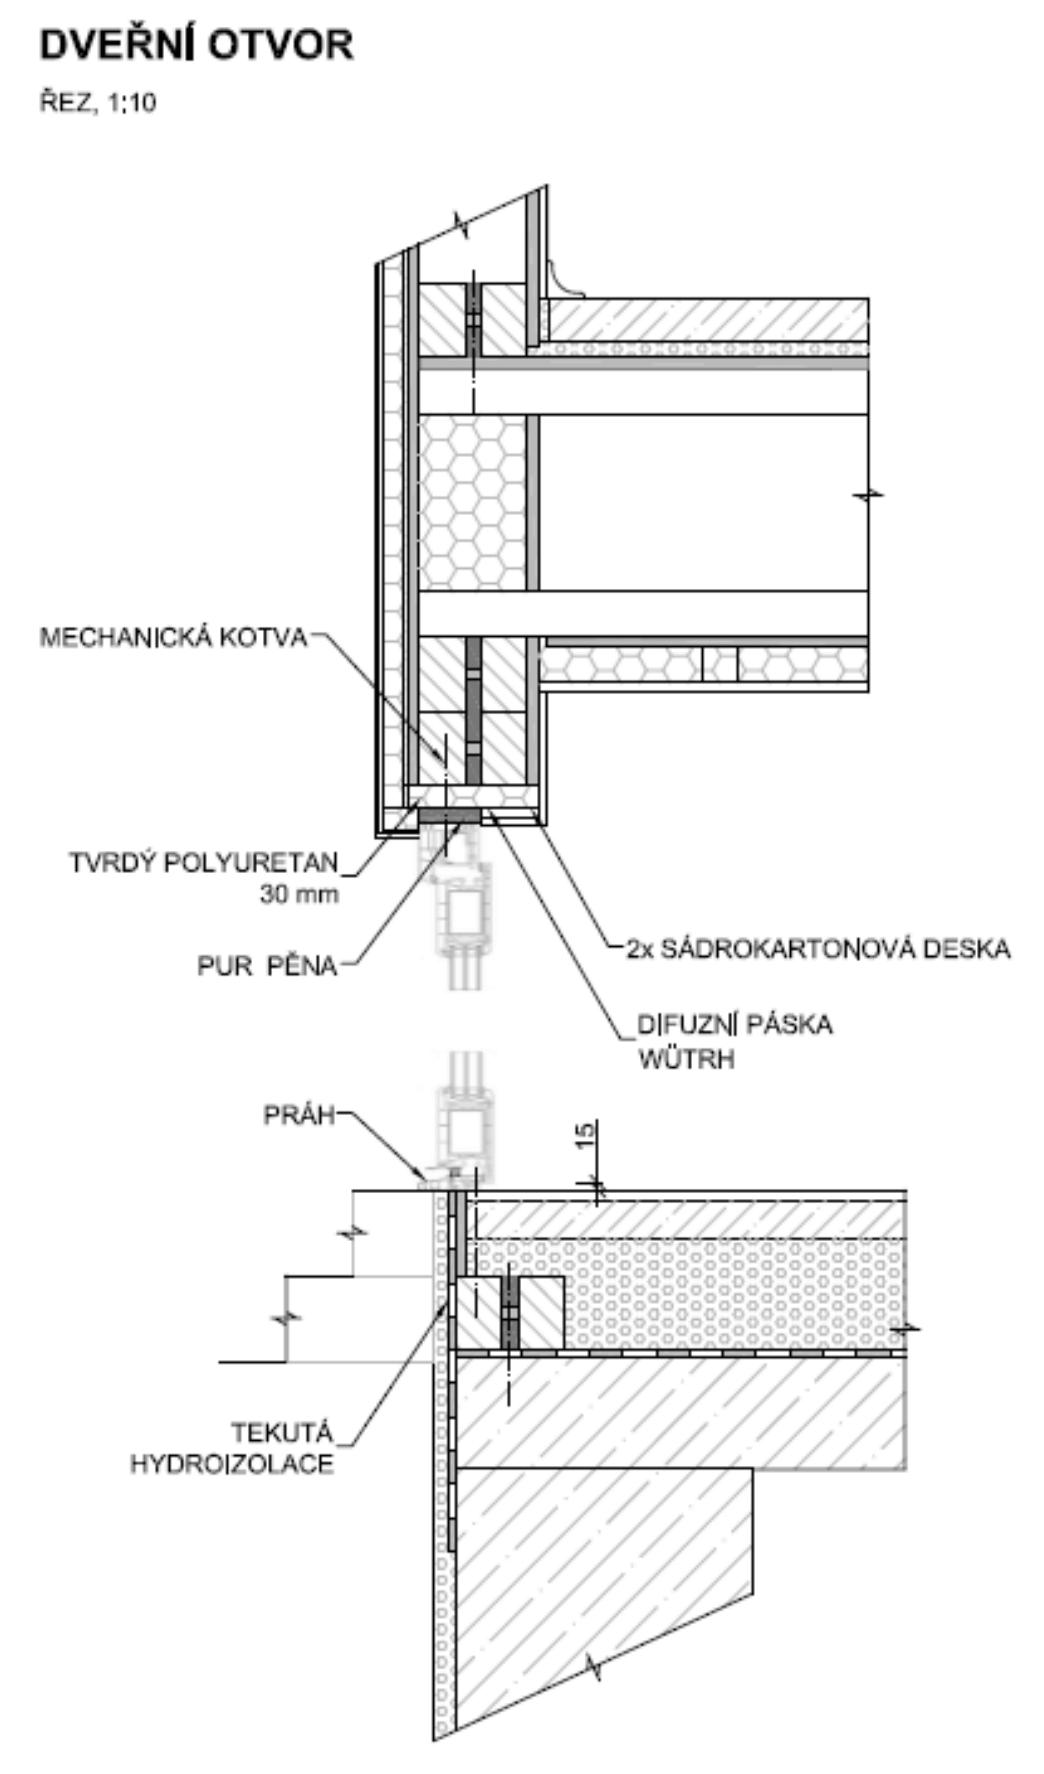 Dveřní otvor - nákres   Homing.cz